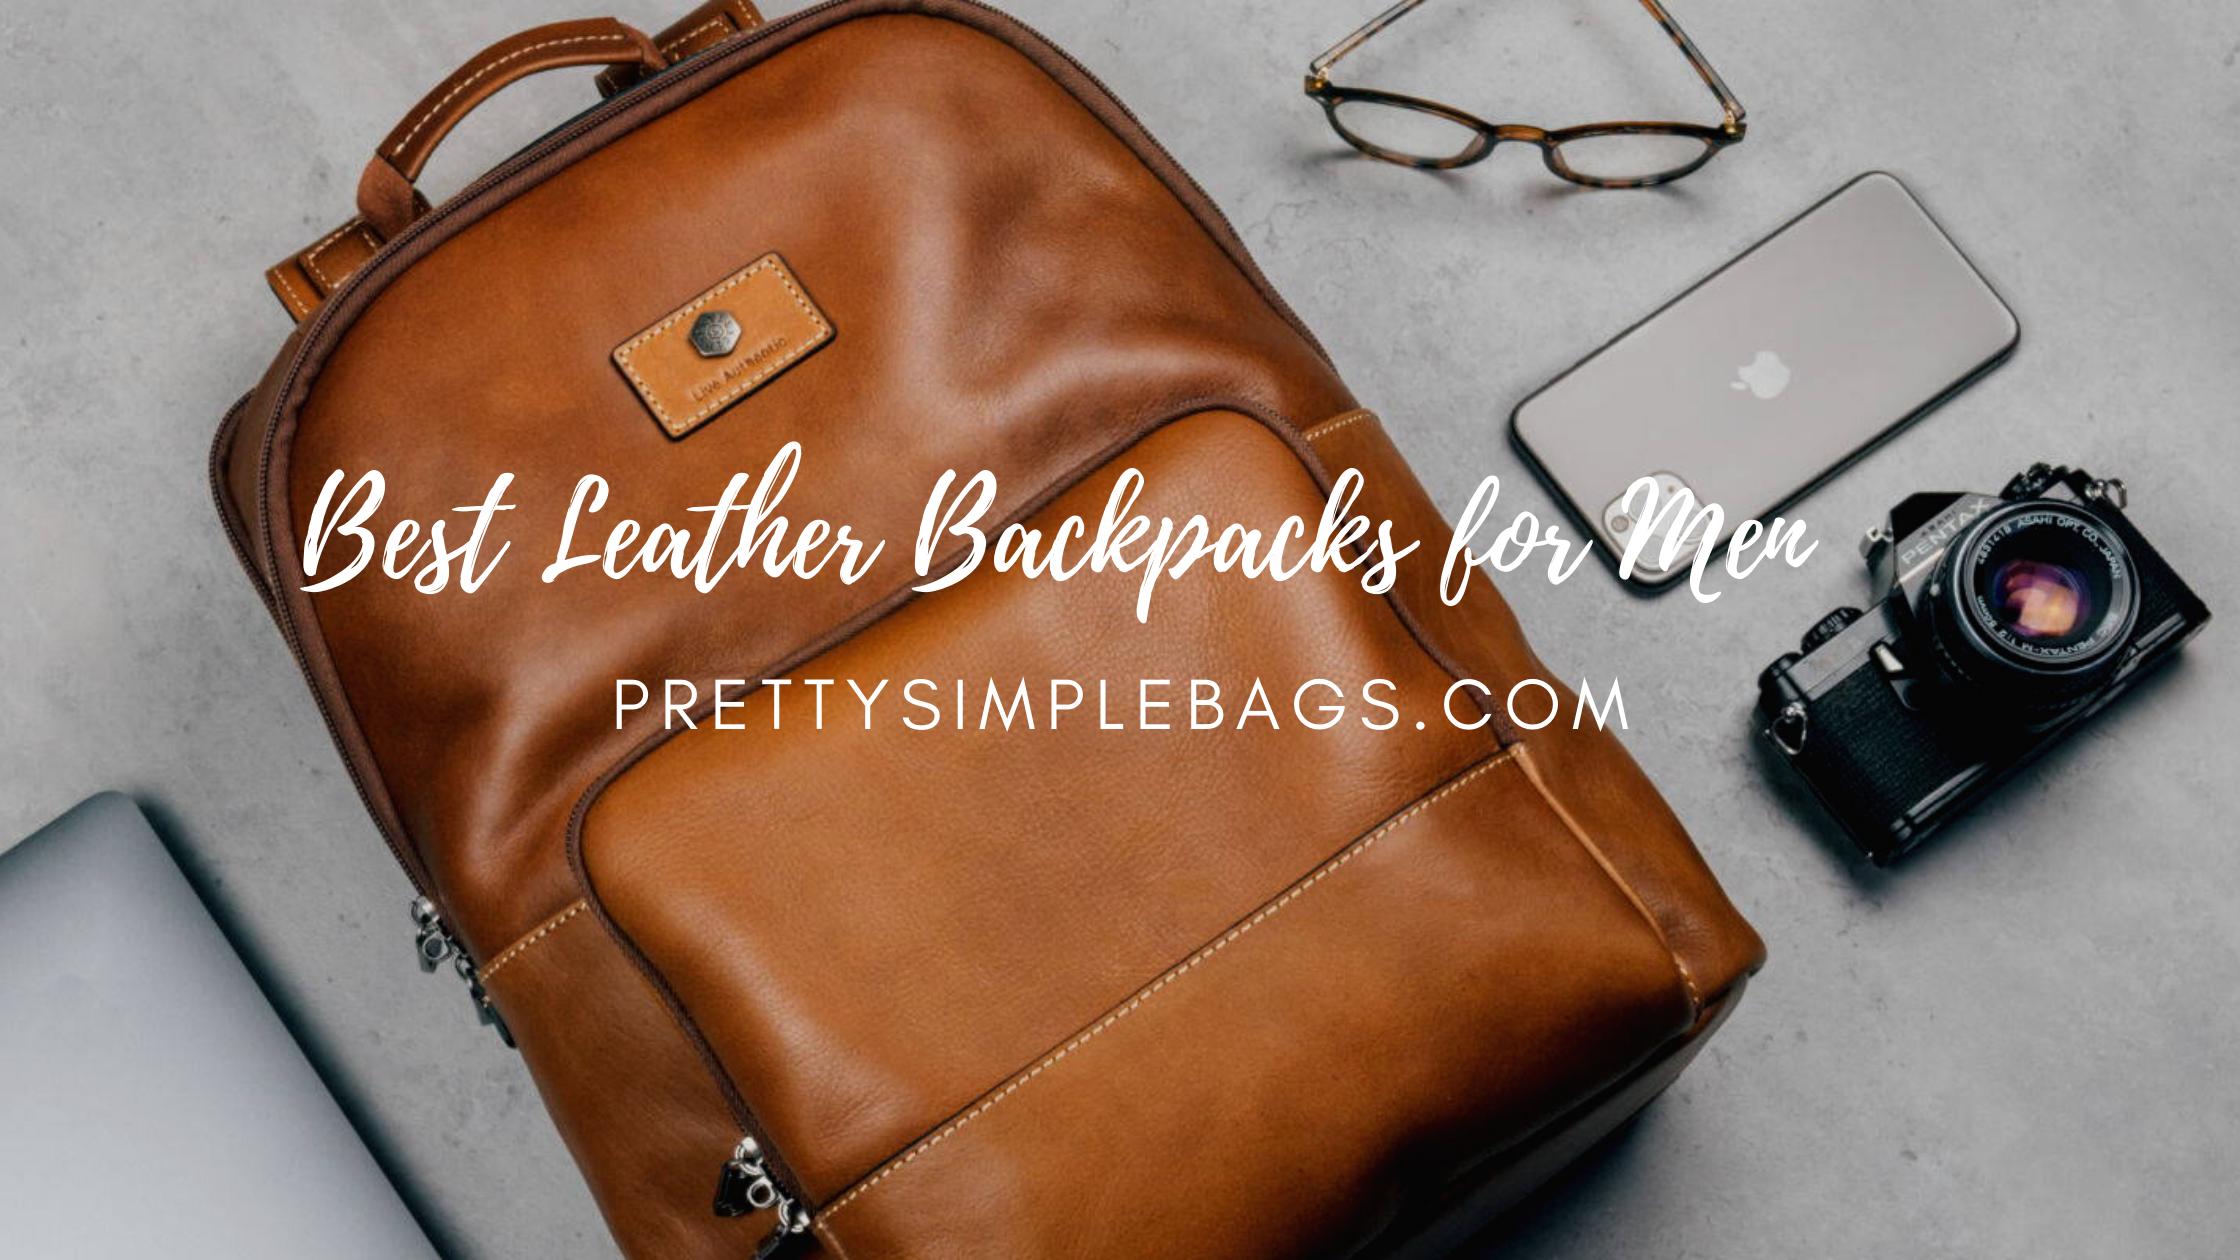 best leather backpacks for men